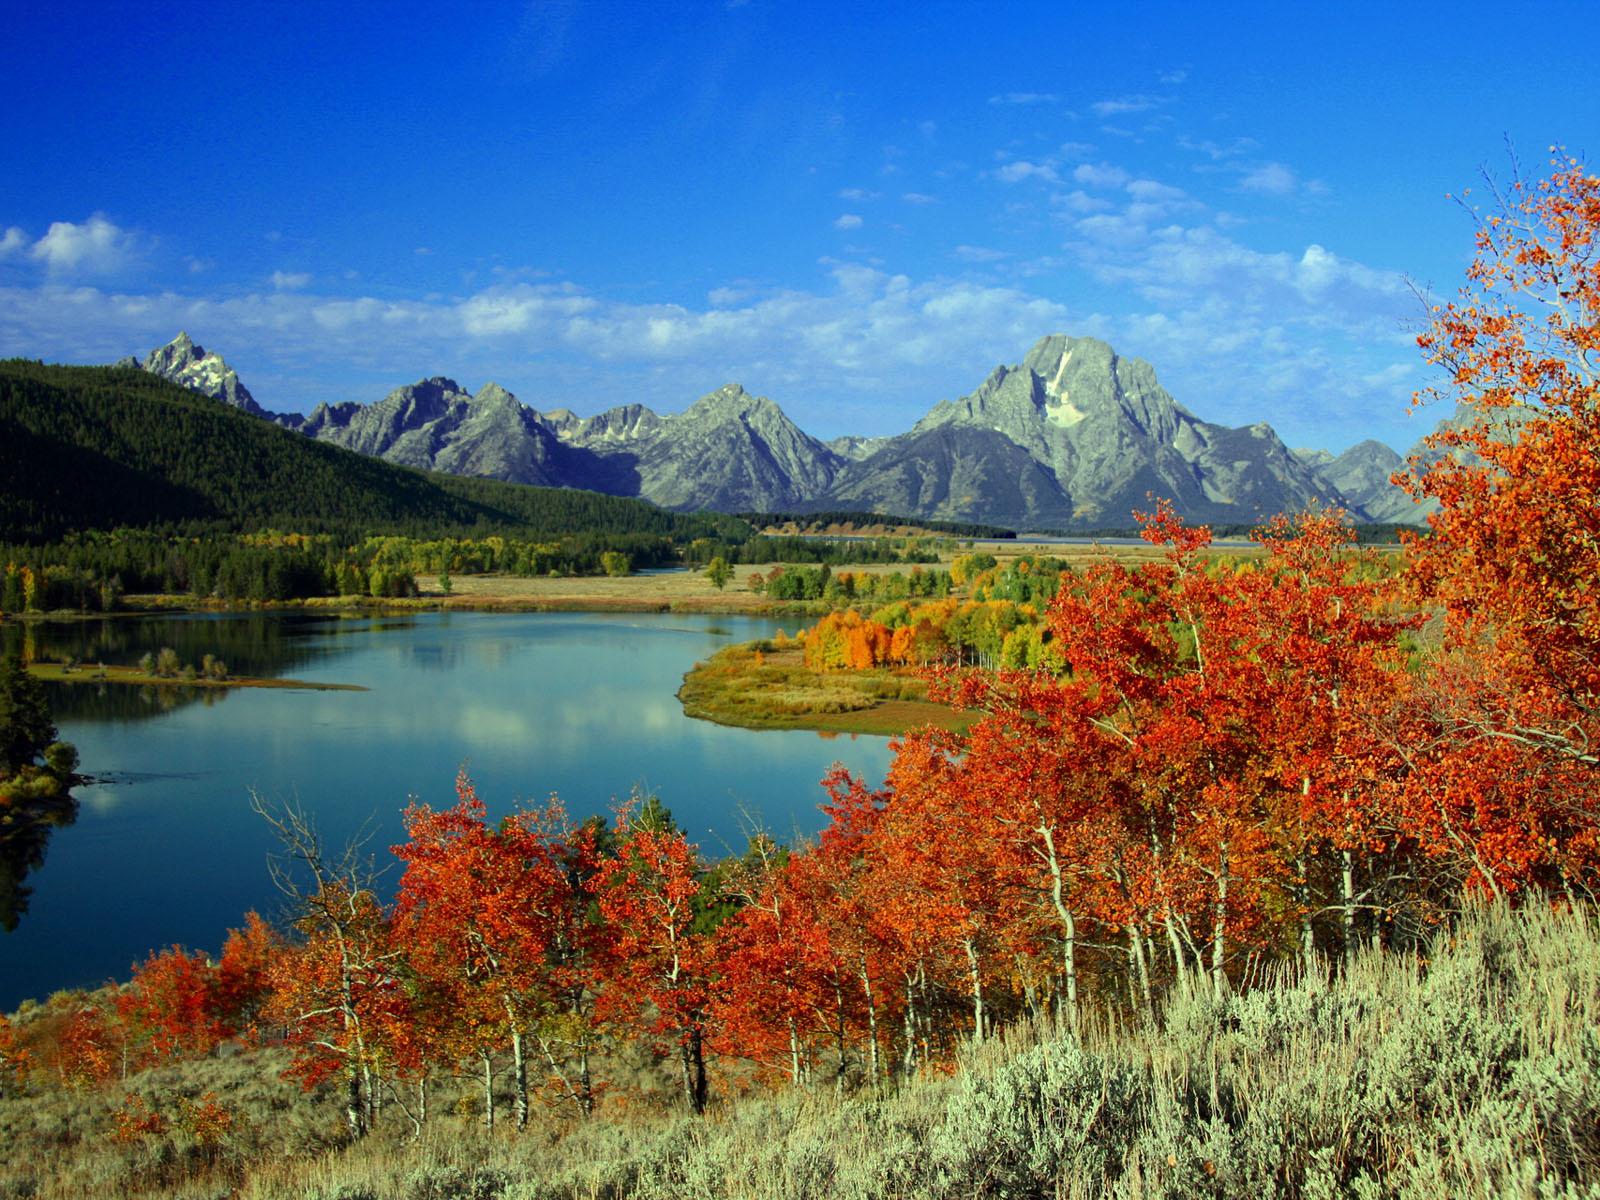 National Park Wallpapers GrandTeton National Park Desktop Wallpapers 1600x1200